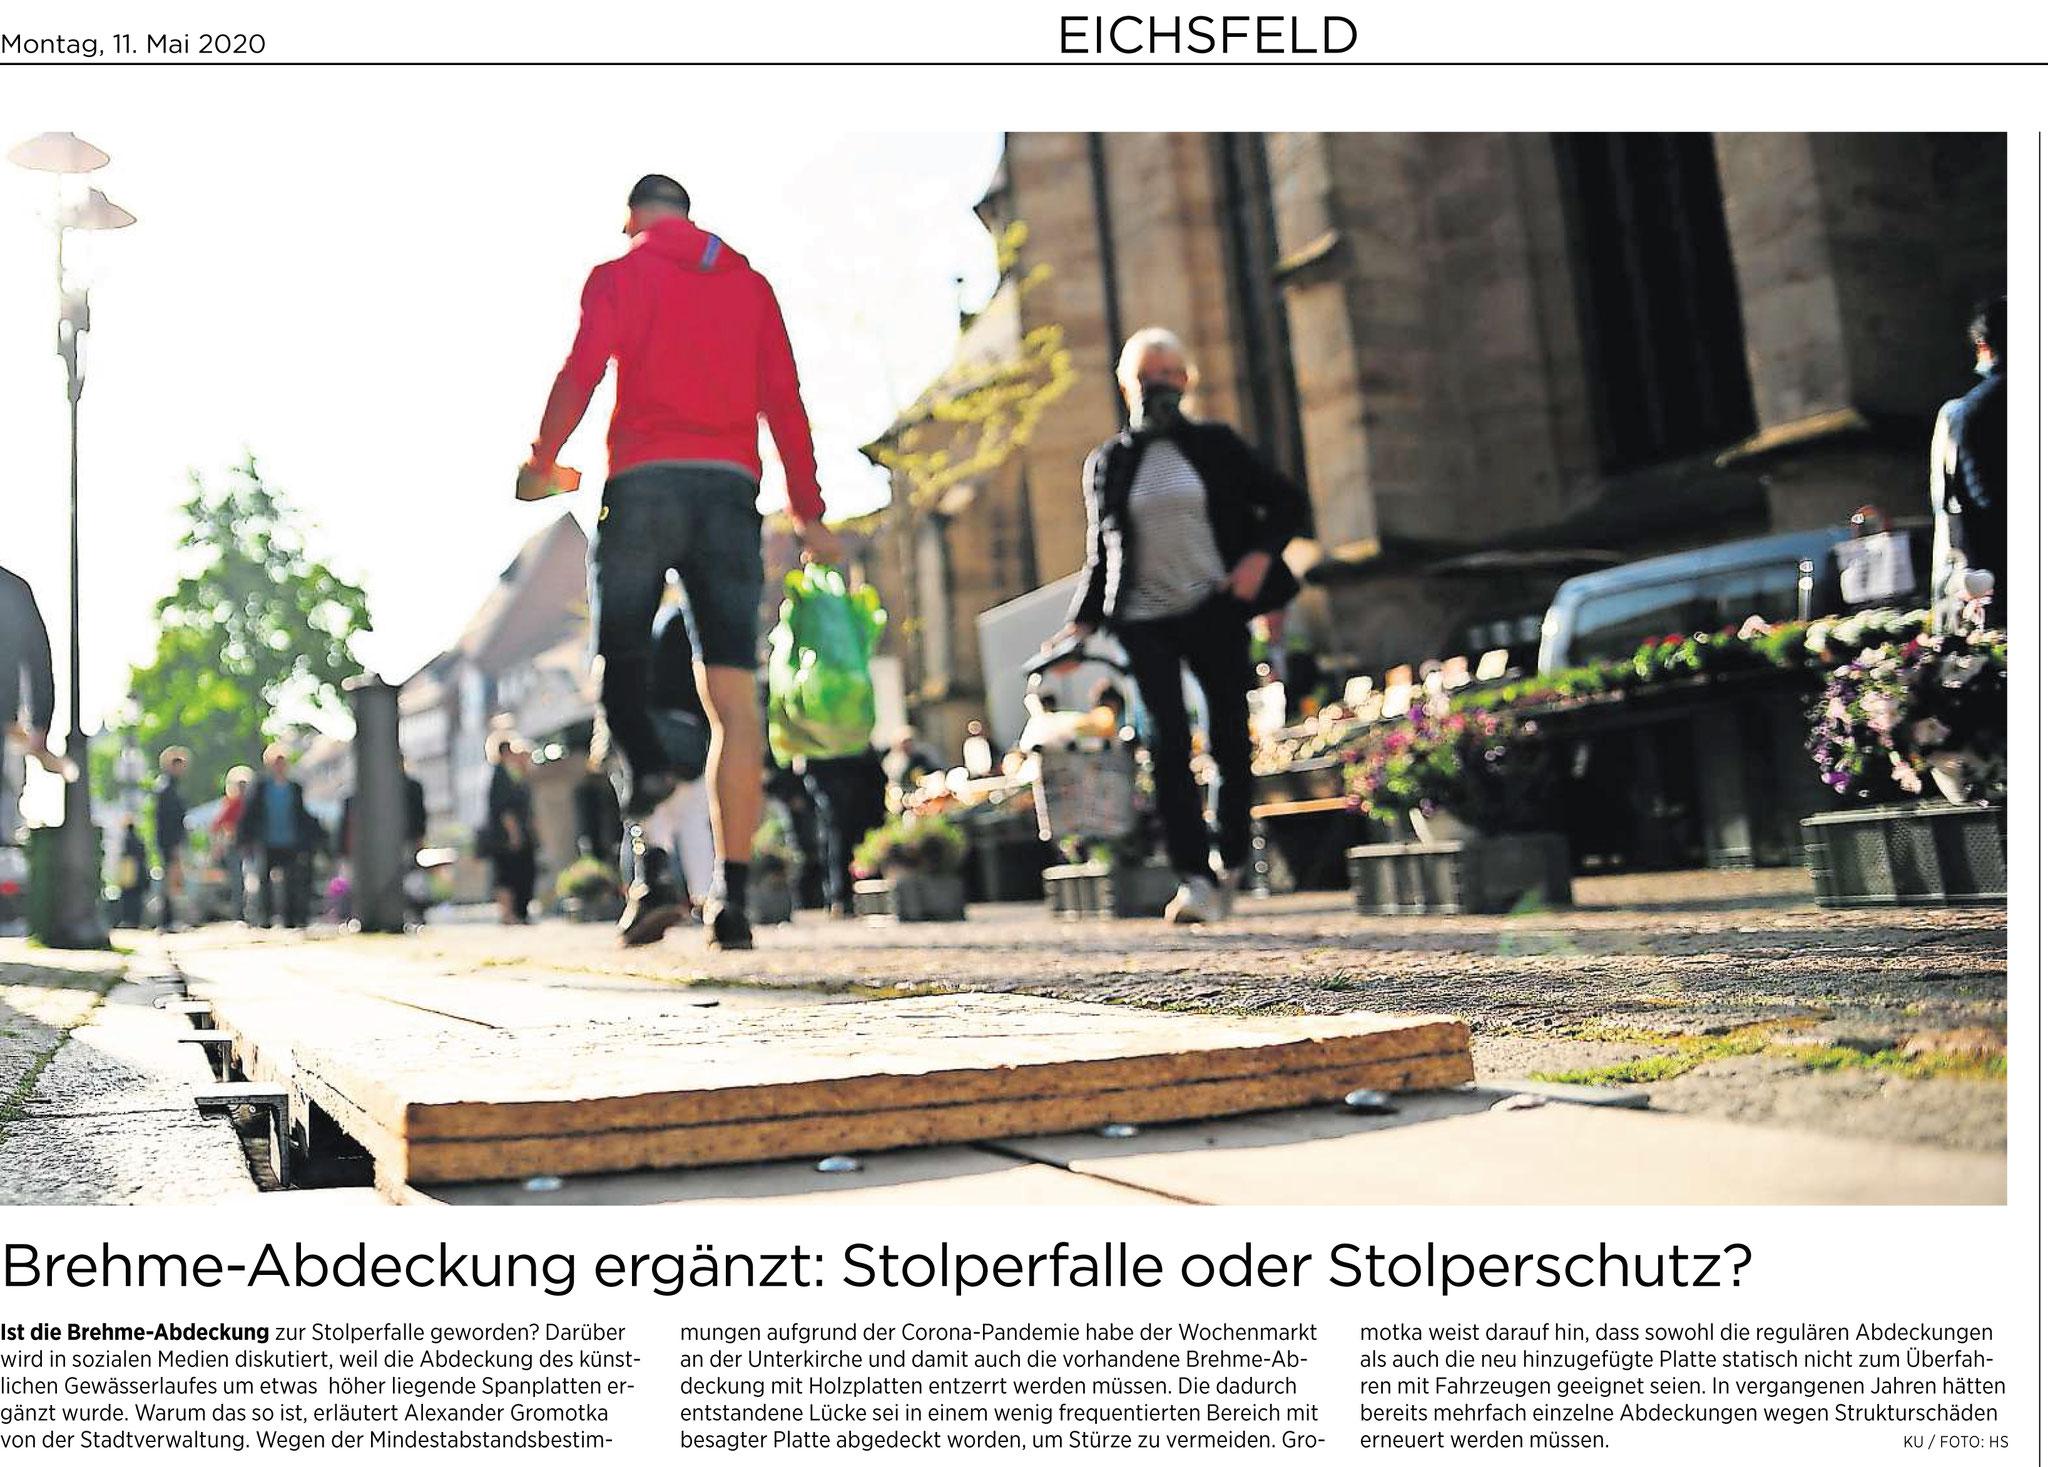 Eichsfelder Tageblatt 11.05.2020